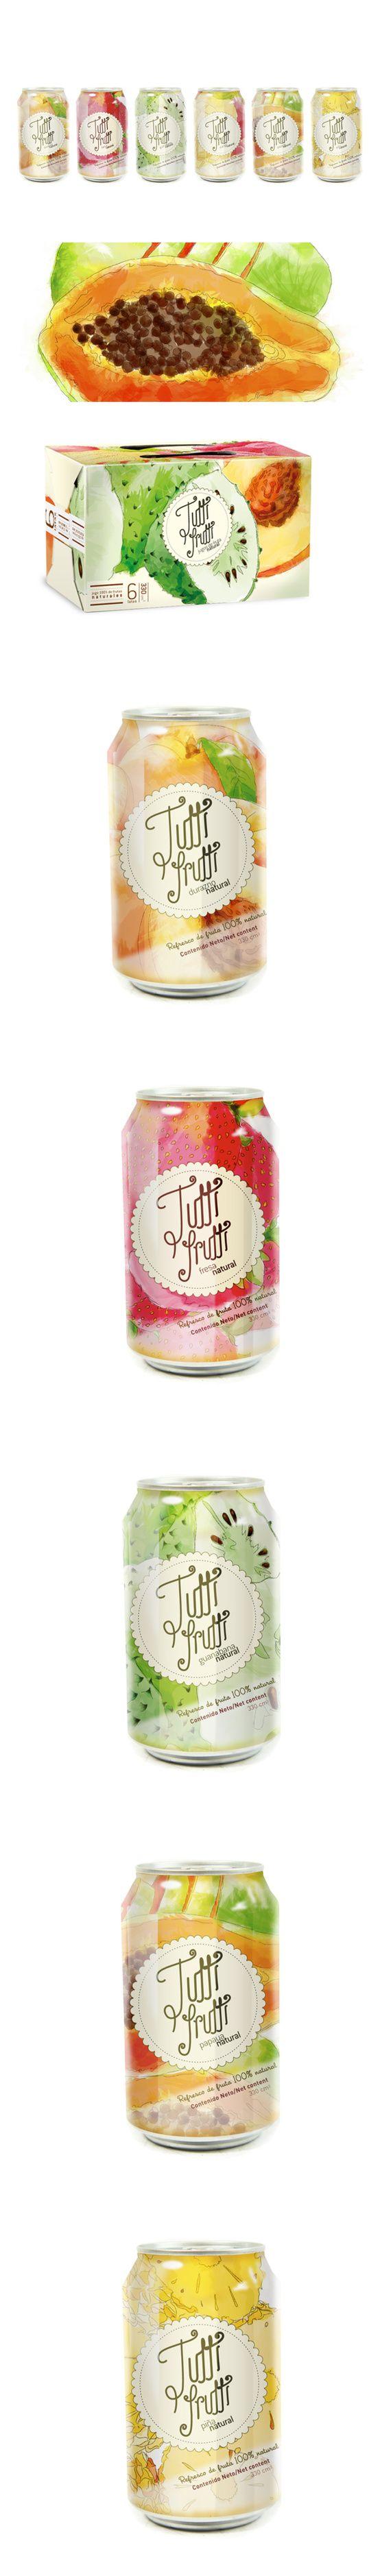 Jugos Tutti Frutti has beautiful fruit graphics on the packaging PD